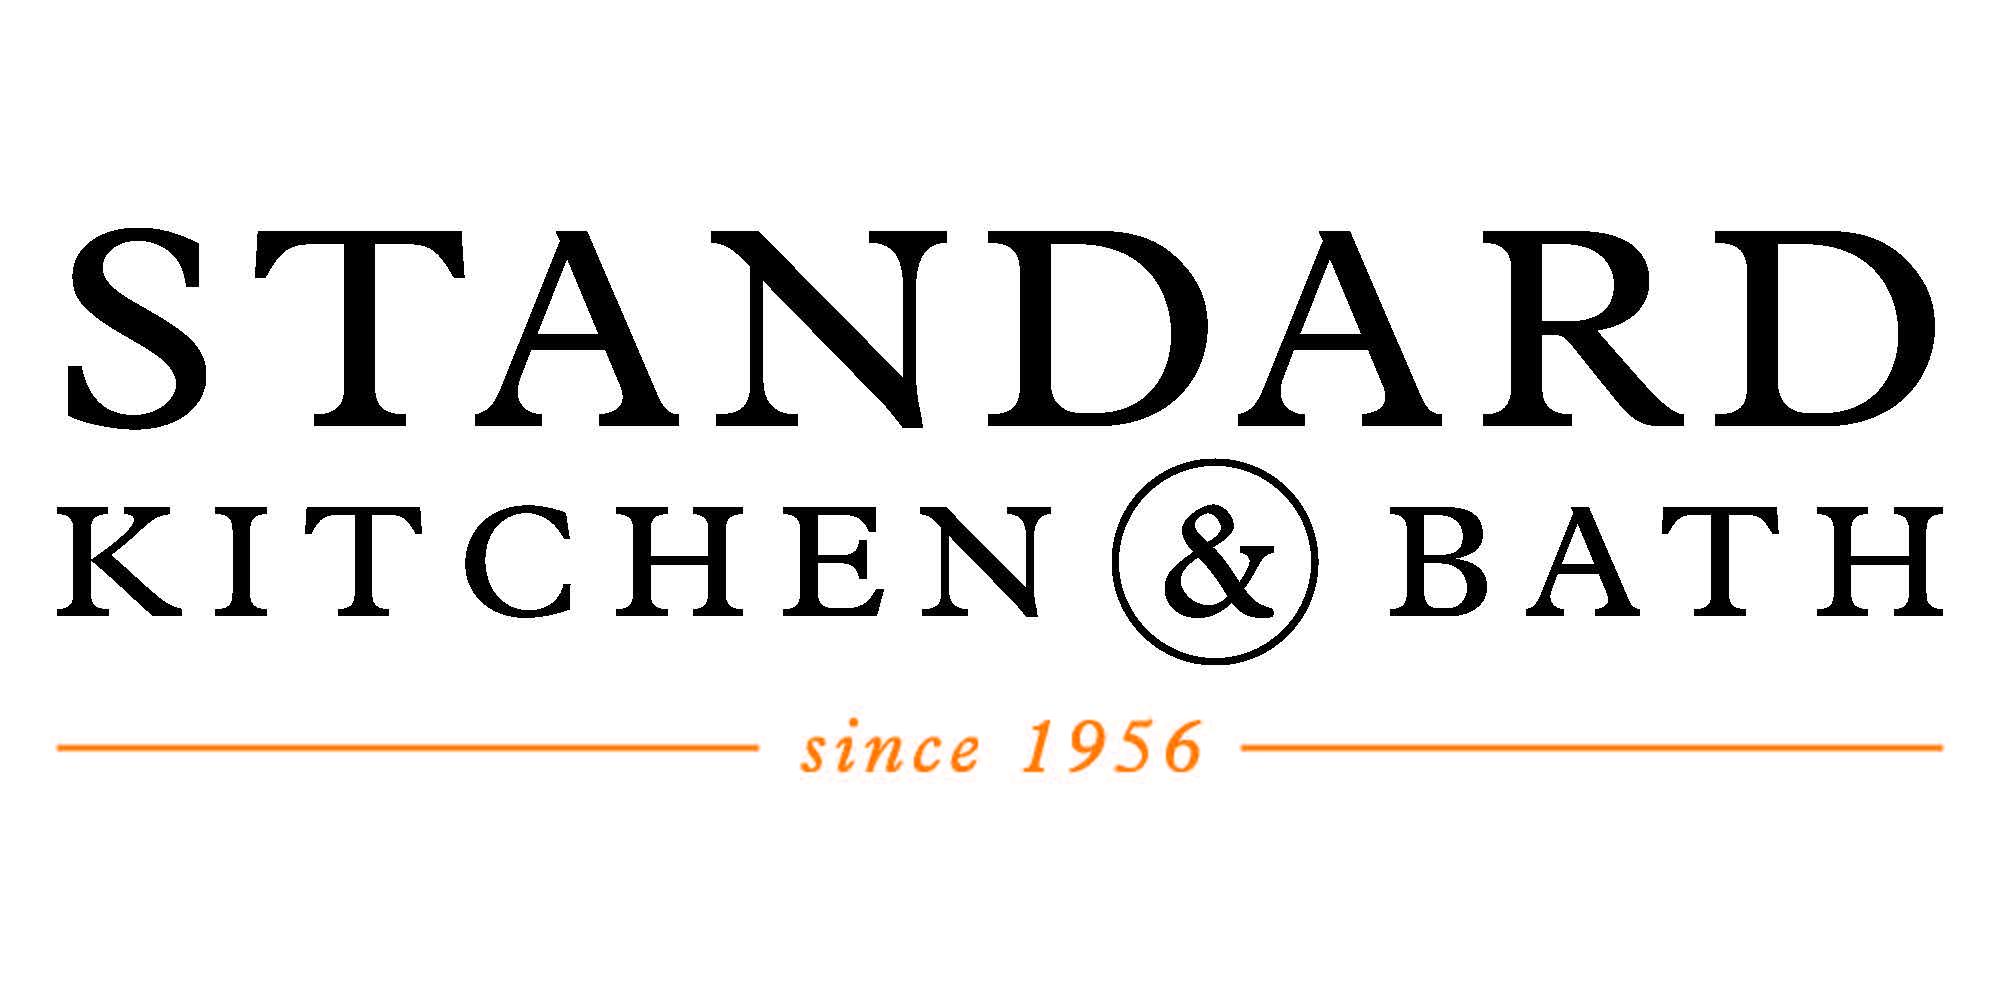 Standard Kitchen & Bath 8719 Kingston Pike, Knoxville, TN 37923 - YP.com